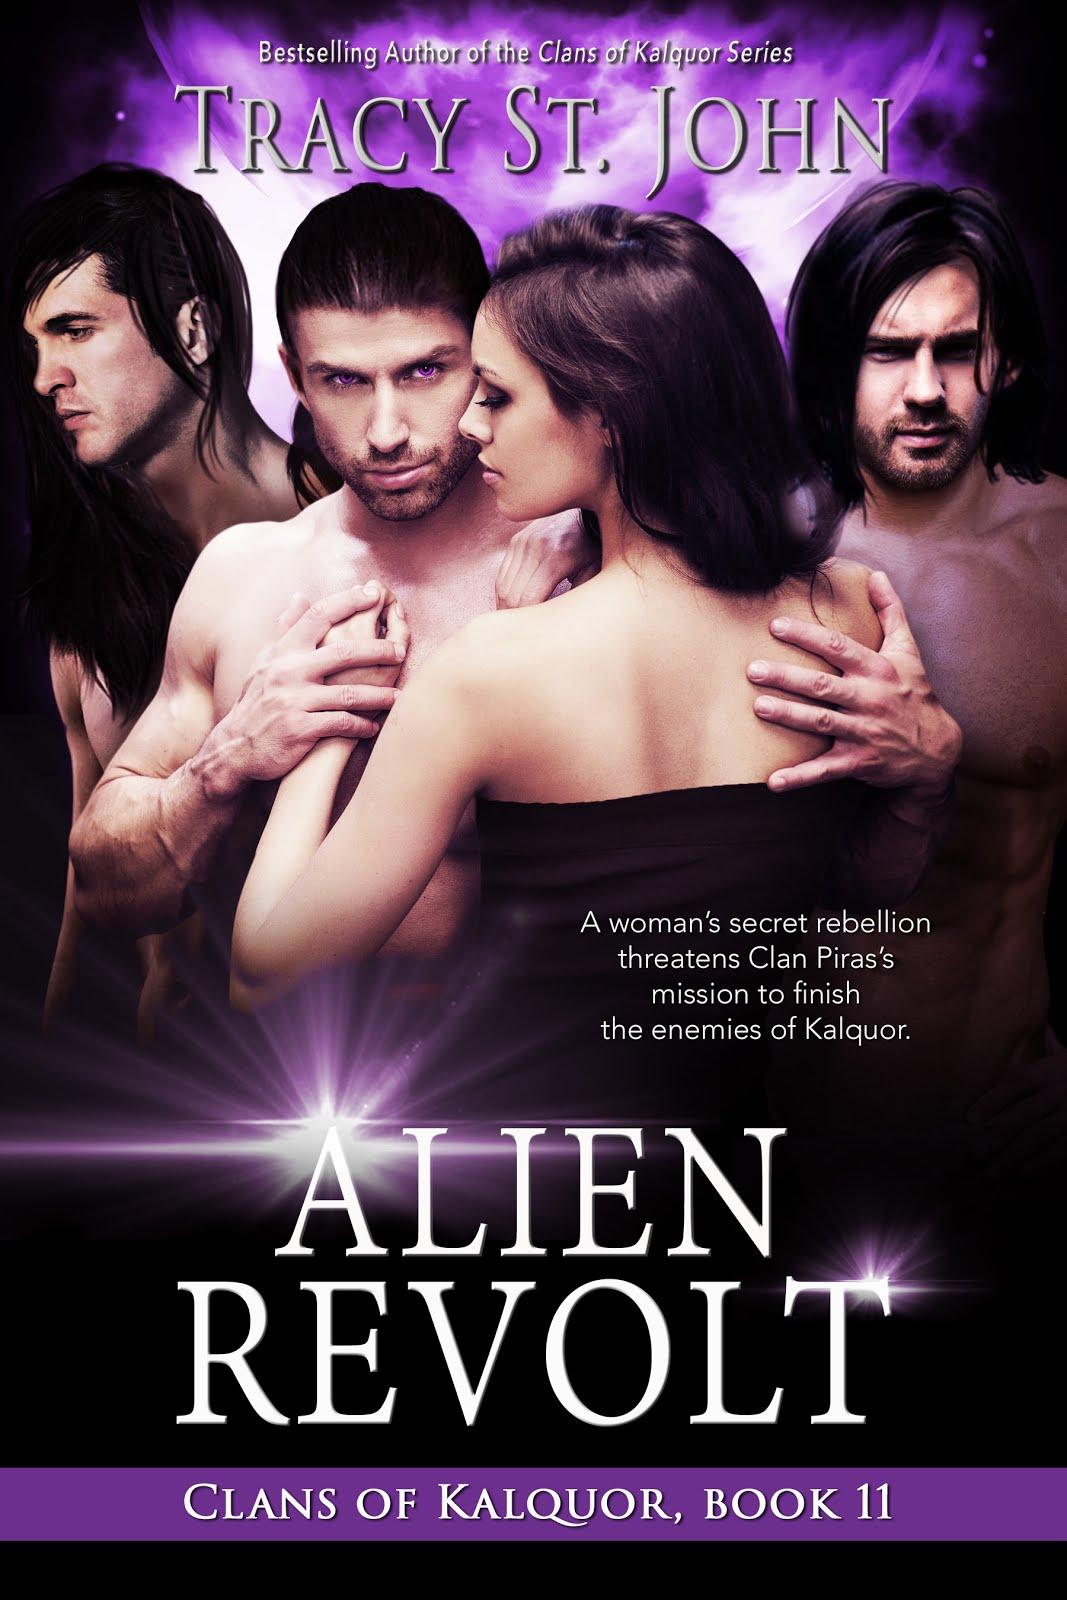 Alien Revolt (Clans of Kalquor 11)